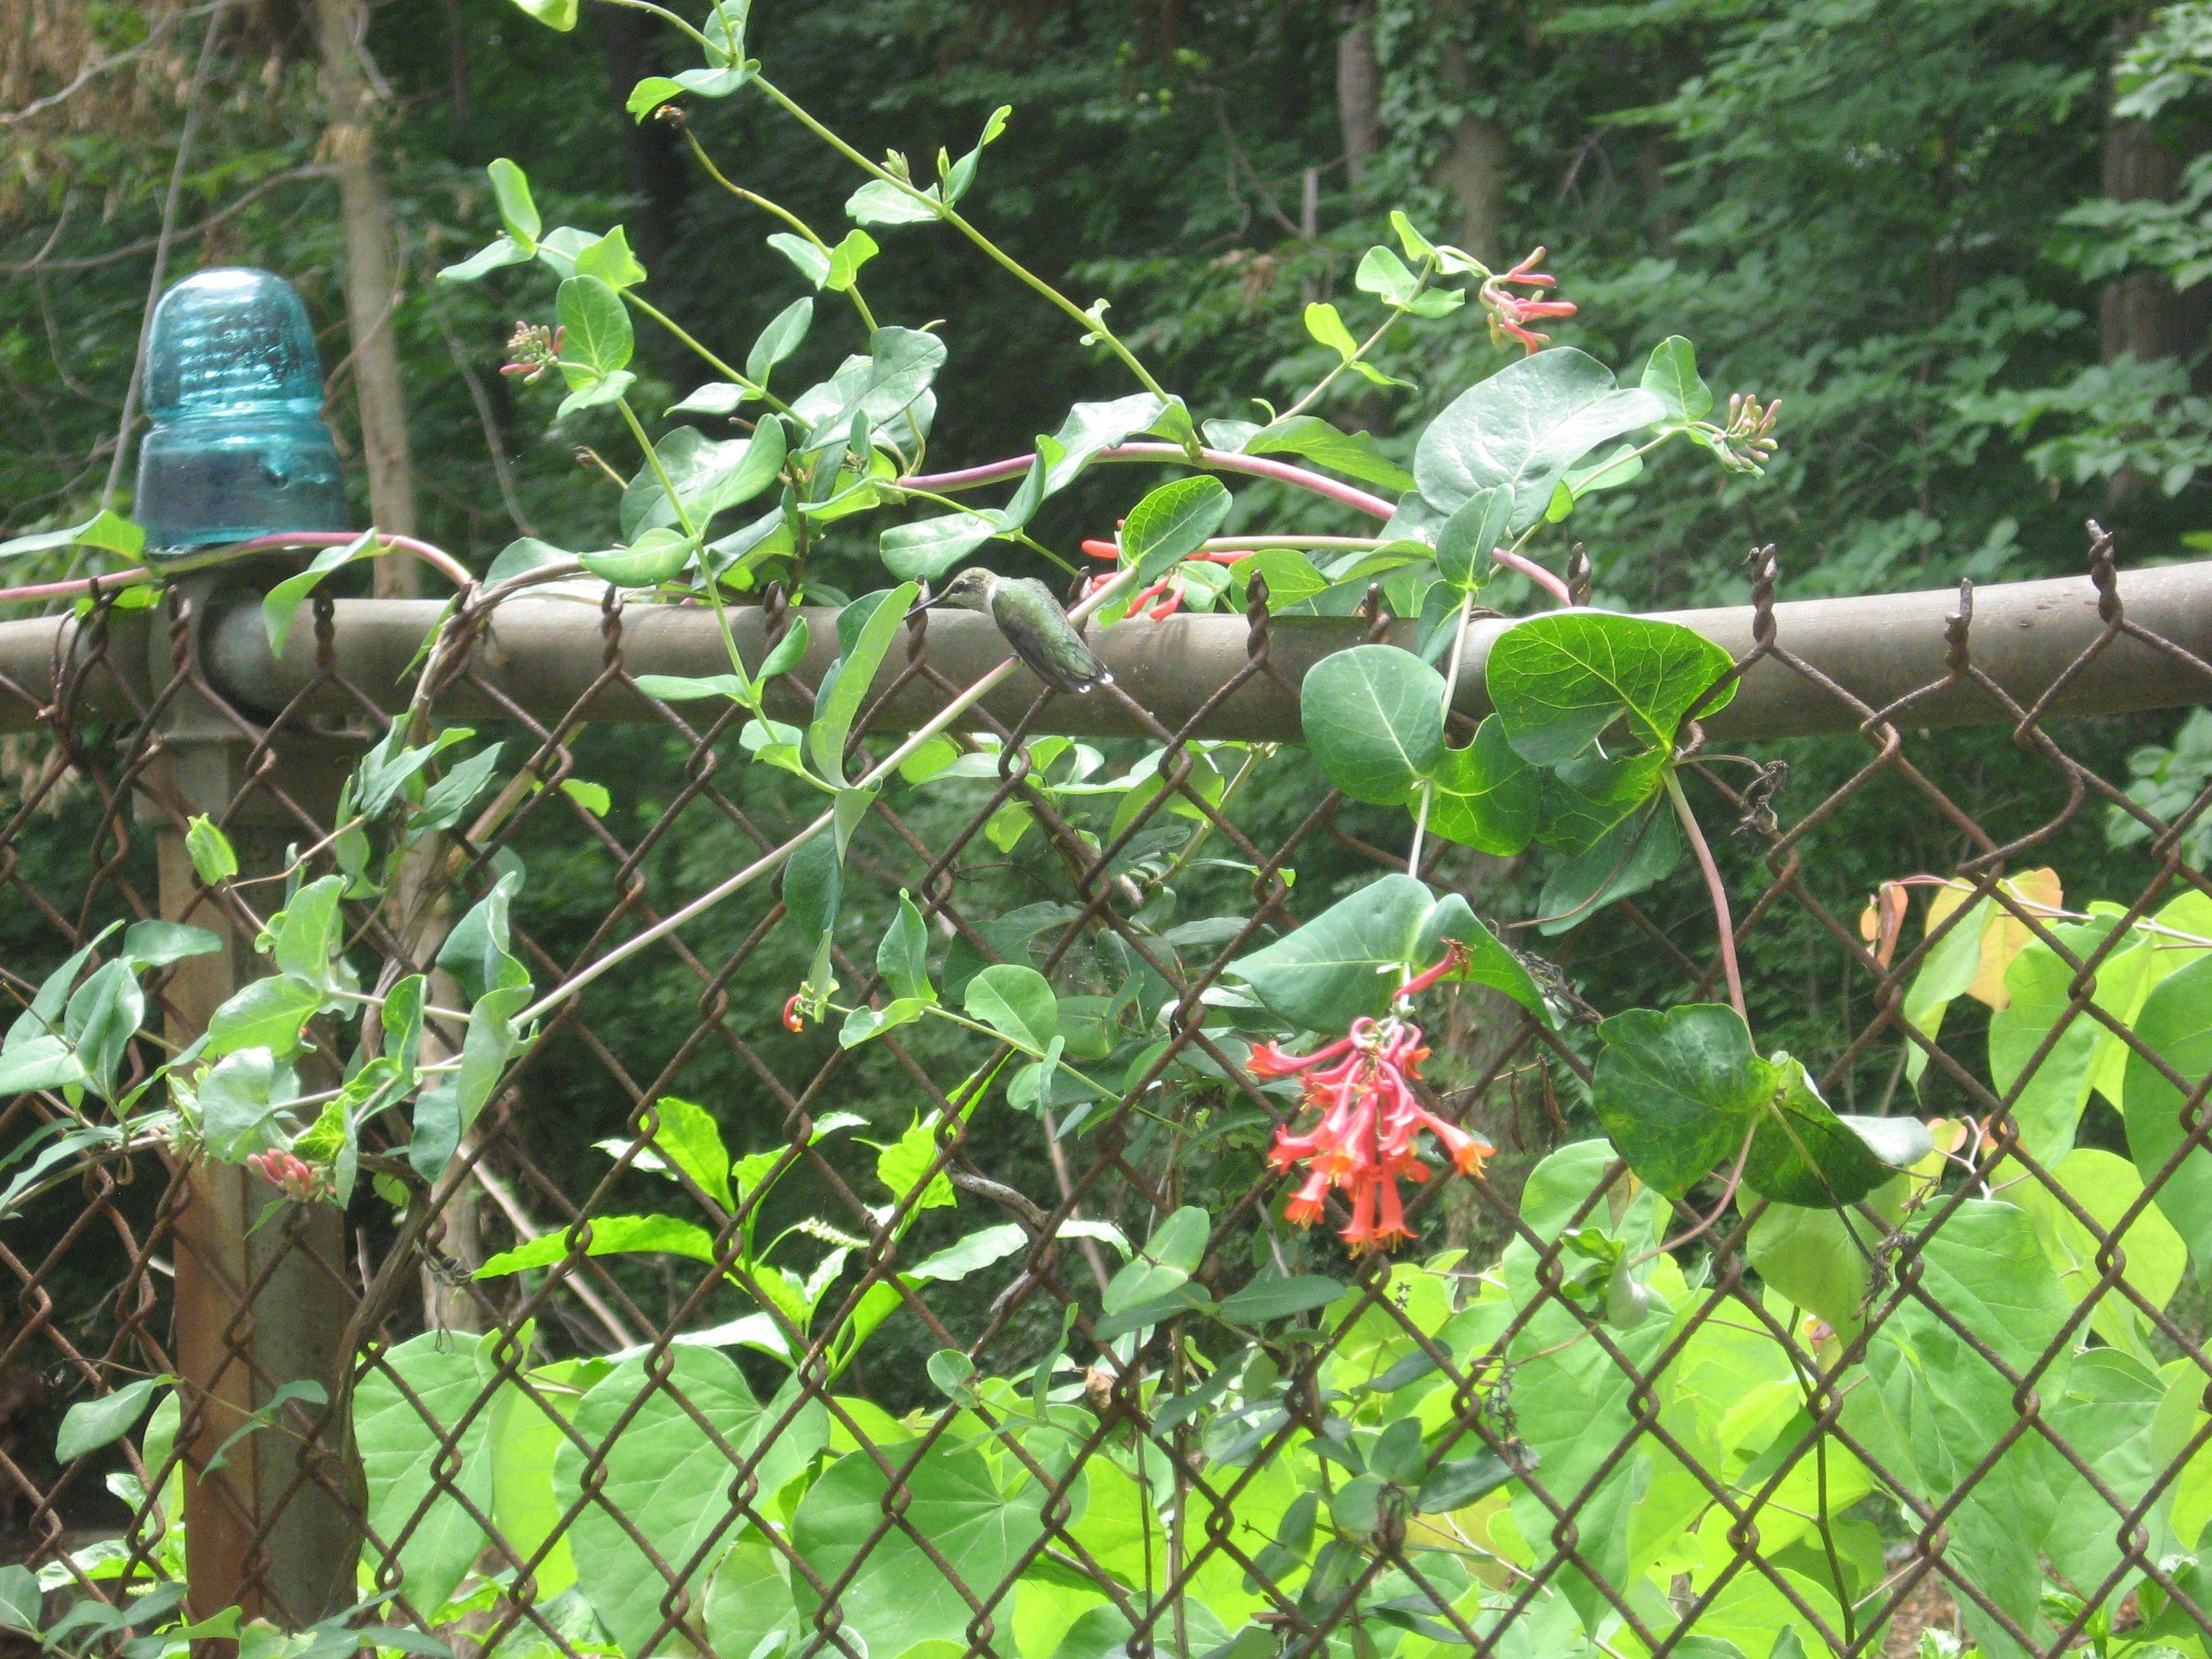 THE HUMMINGBIRD GARDEN OF THE SANGUINE ROOT The Sanguine Root